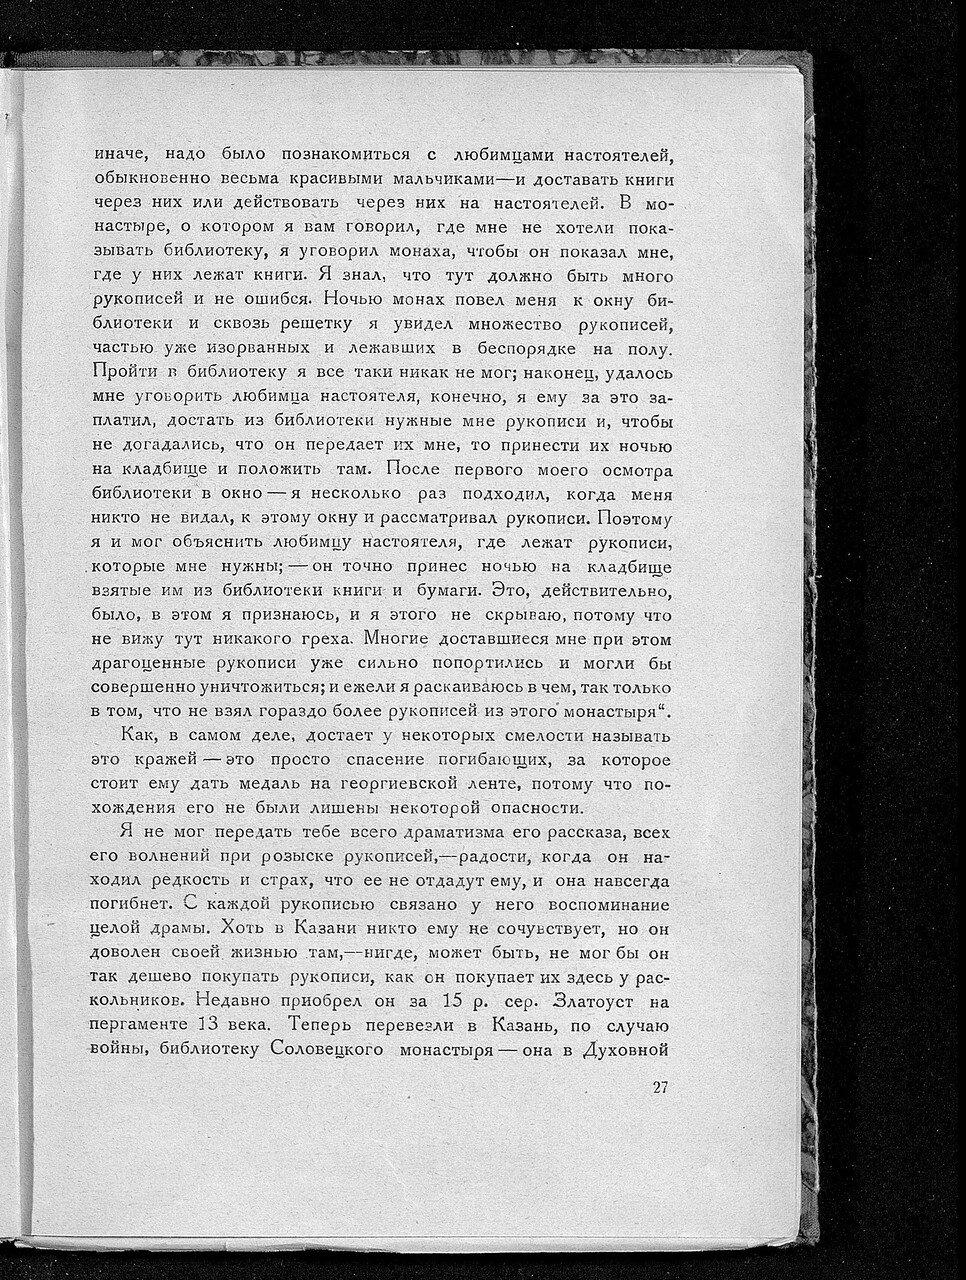 https://img-fotki.yandex.ru/get/900241/199368979.a0/0_214316_60ba2817_XXXL.jpg